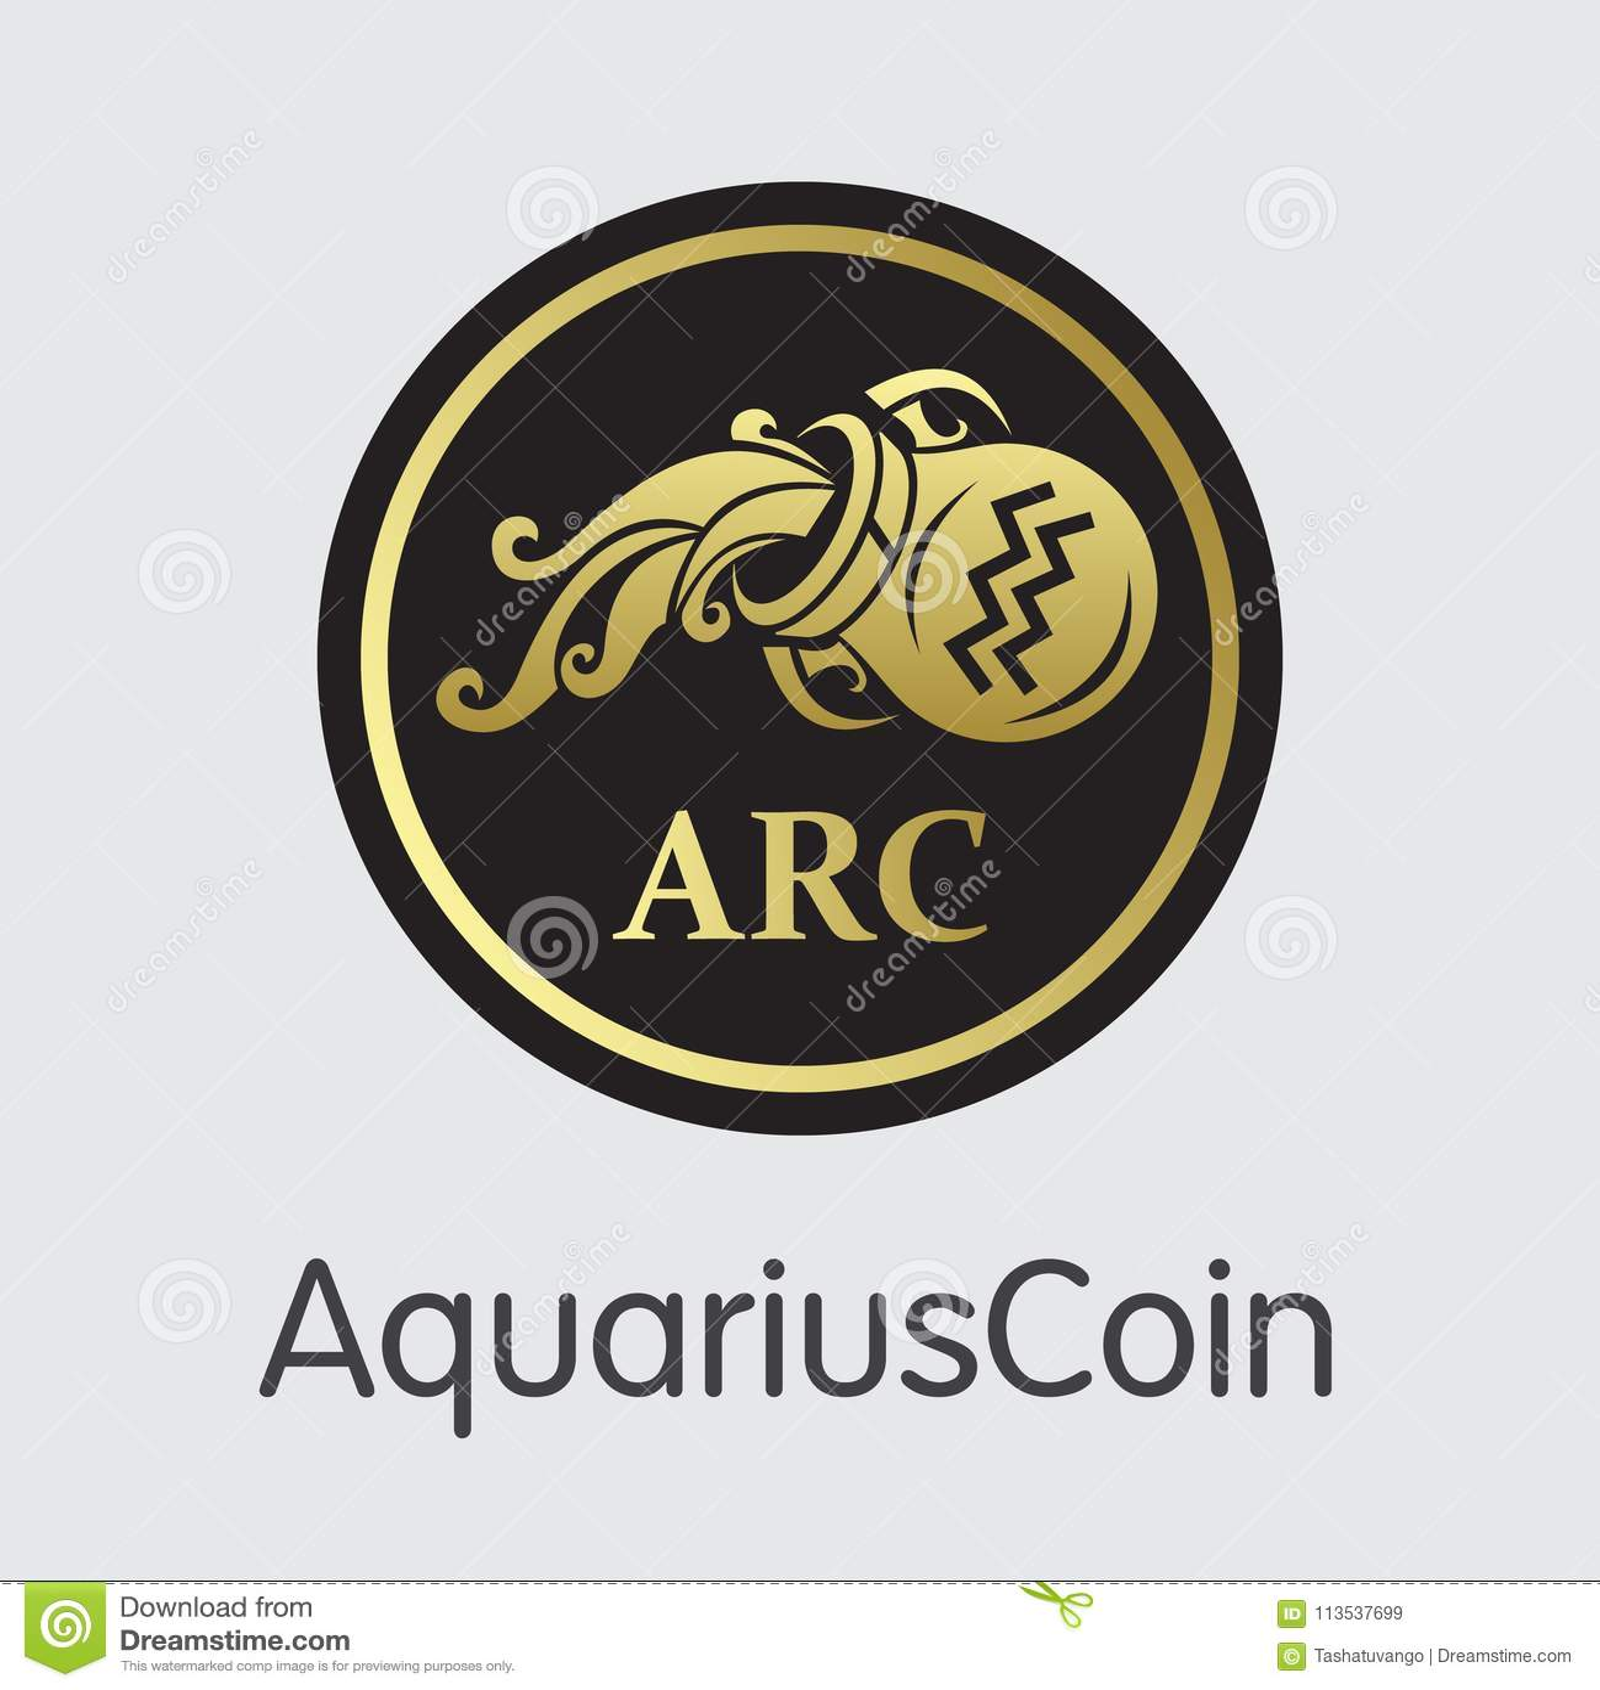 Aquariuscoin Digital Currency Vector Coin Symbol Stock Vector